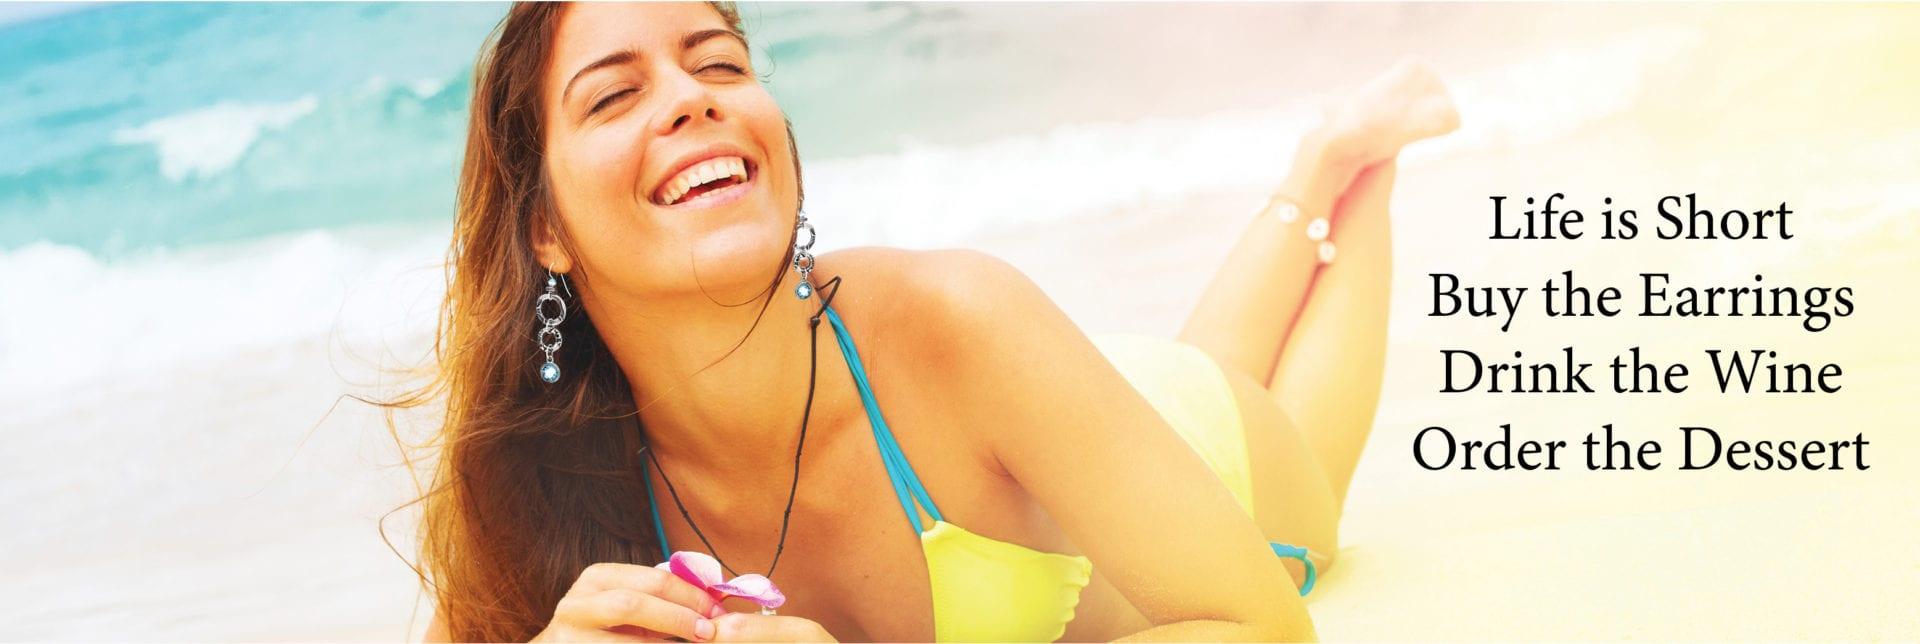 NEW Woman on Beach